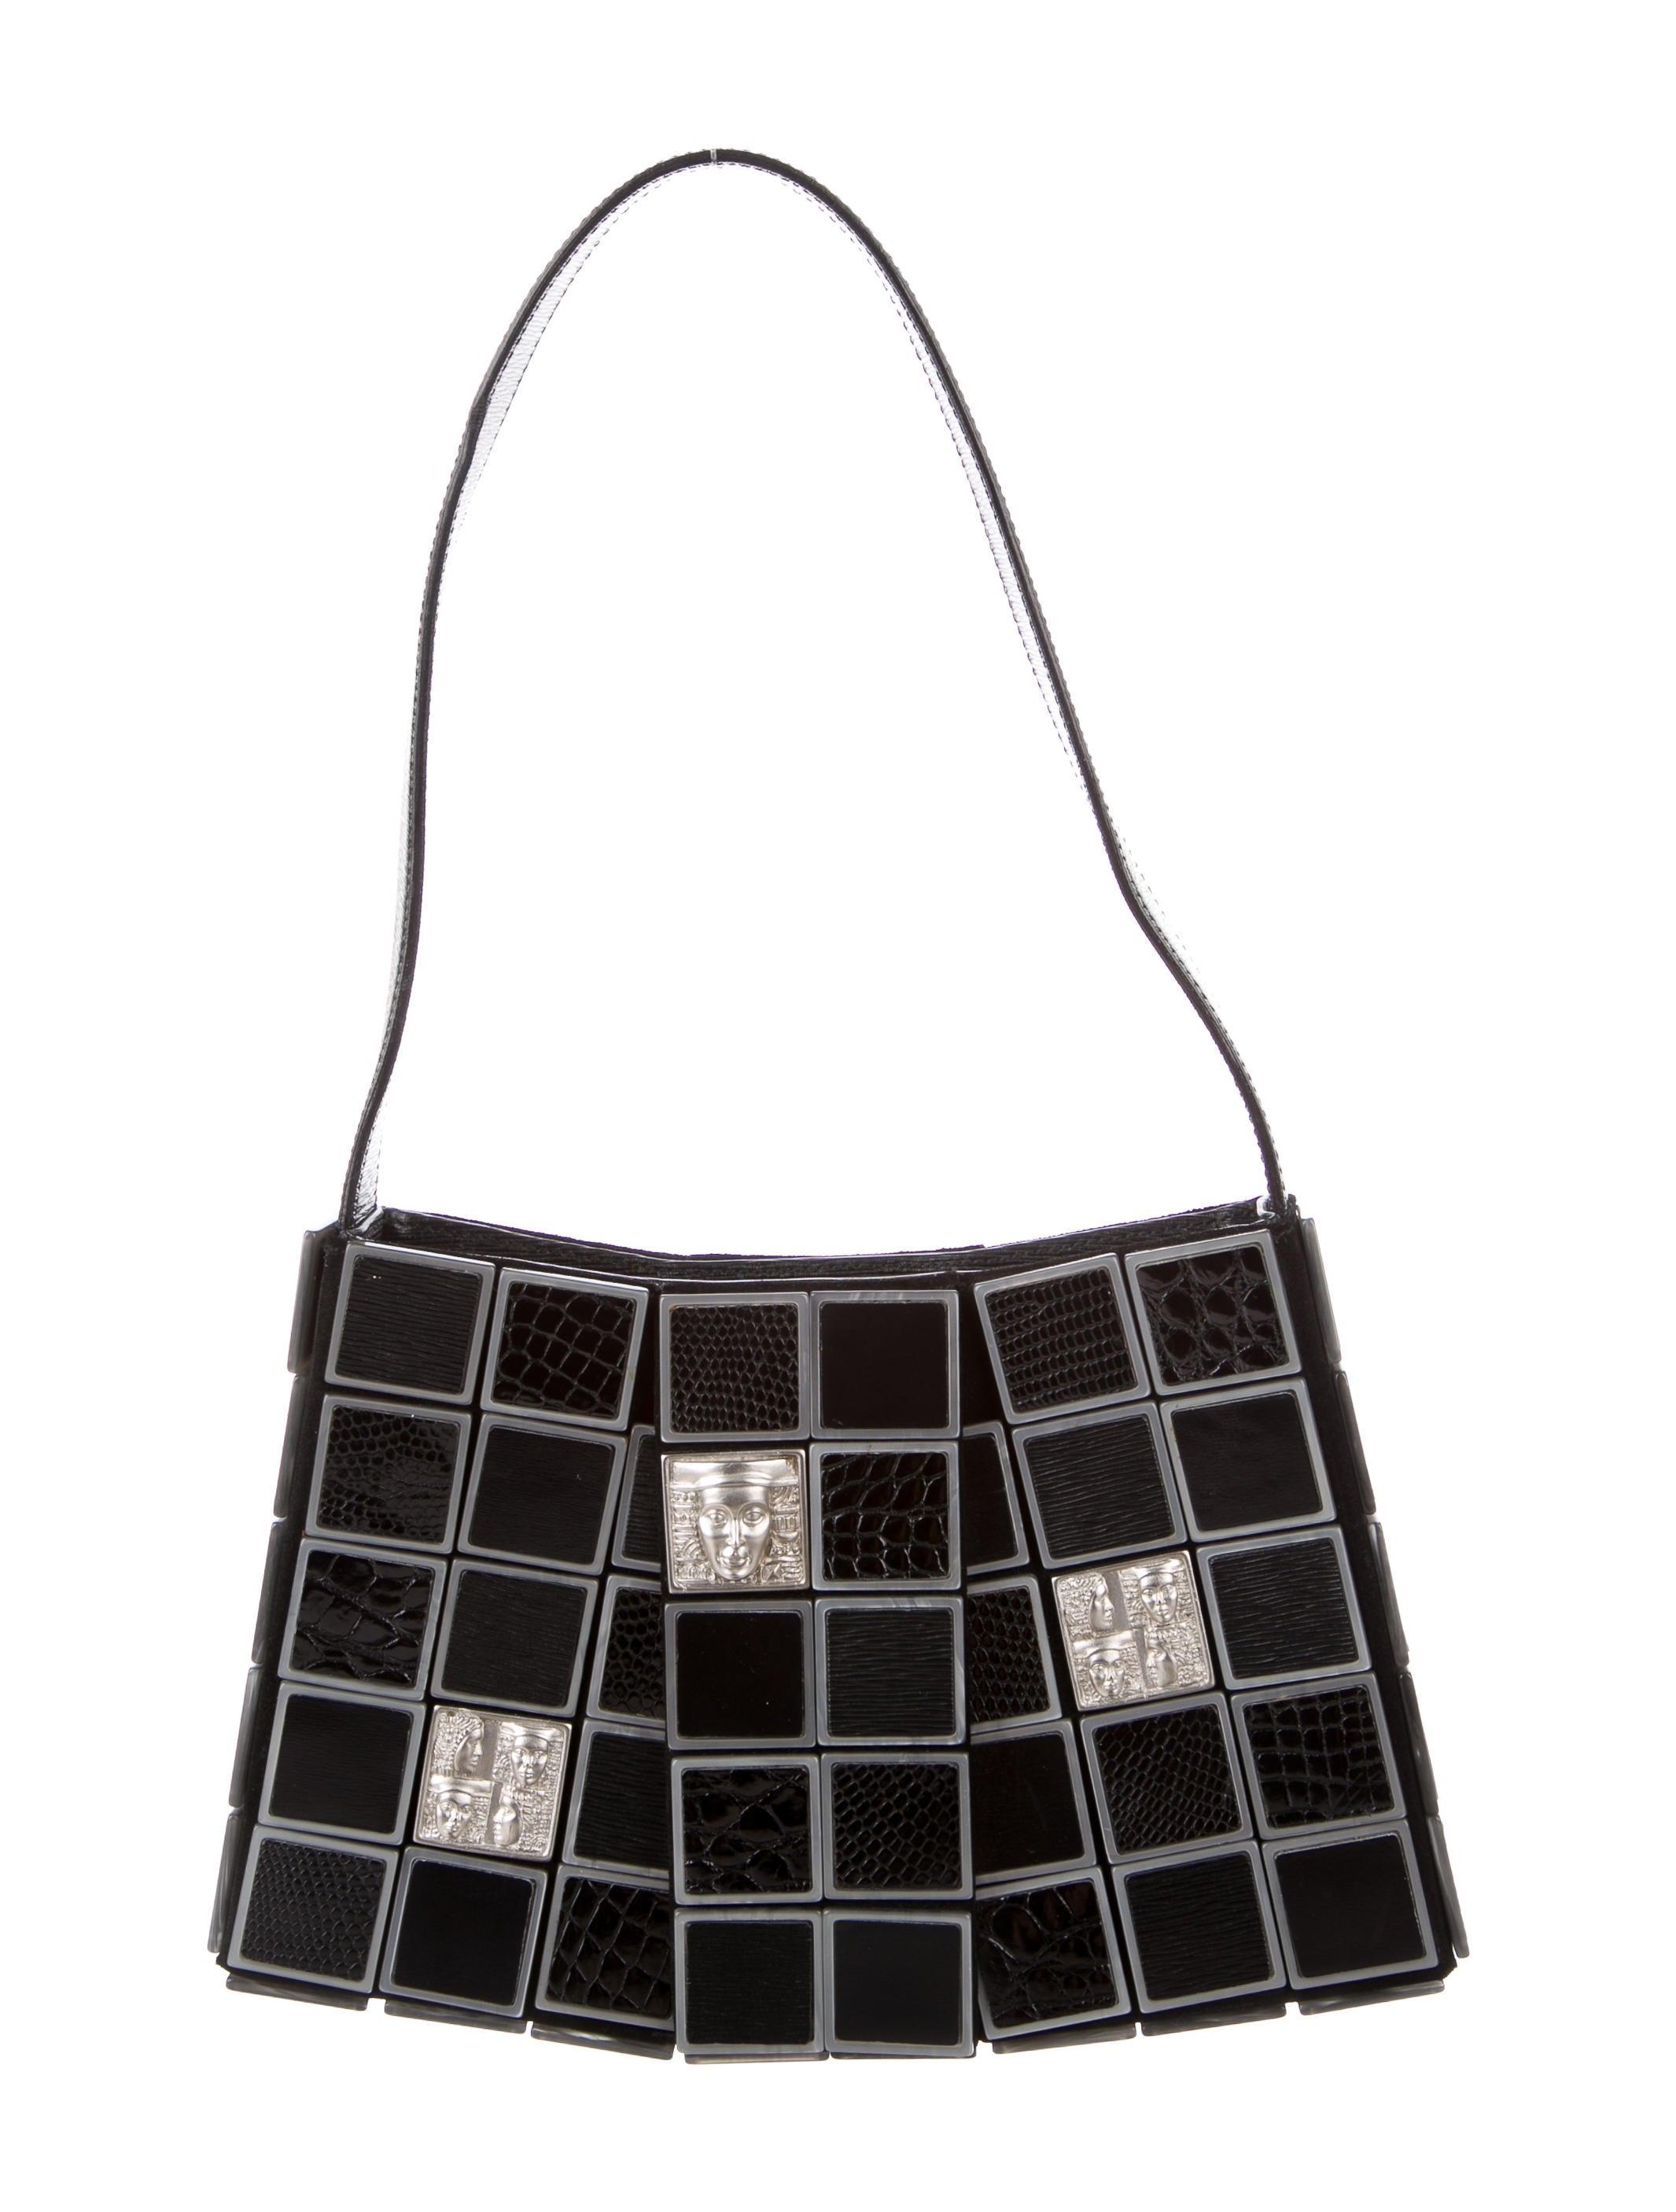 Barry Kieselstein Cord Women Of The World Tiles Bag Handbags Bkc21884 The Realreal